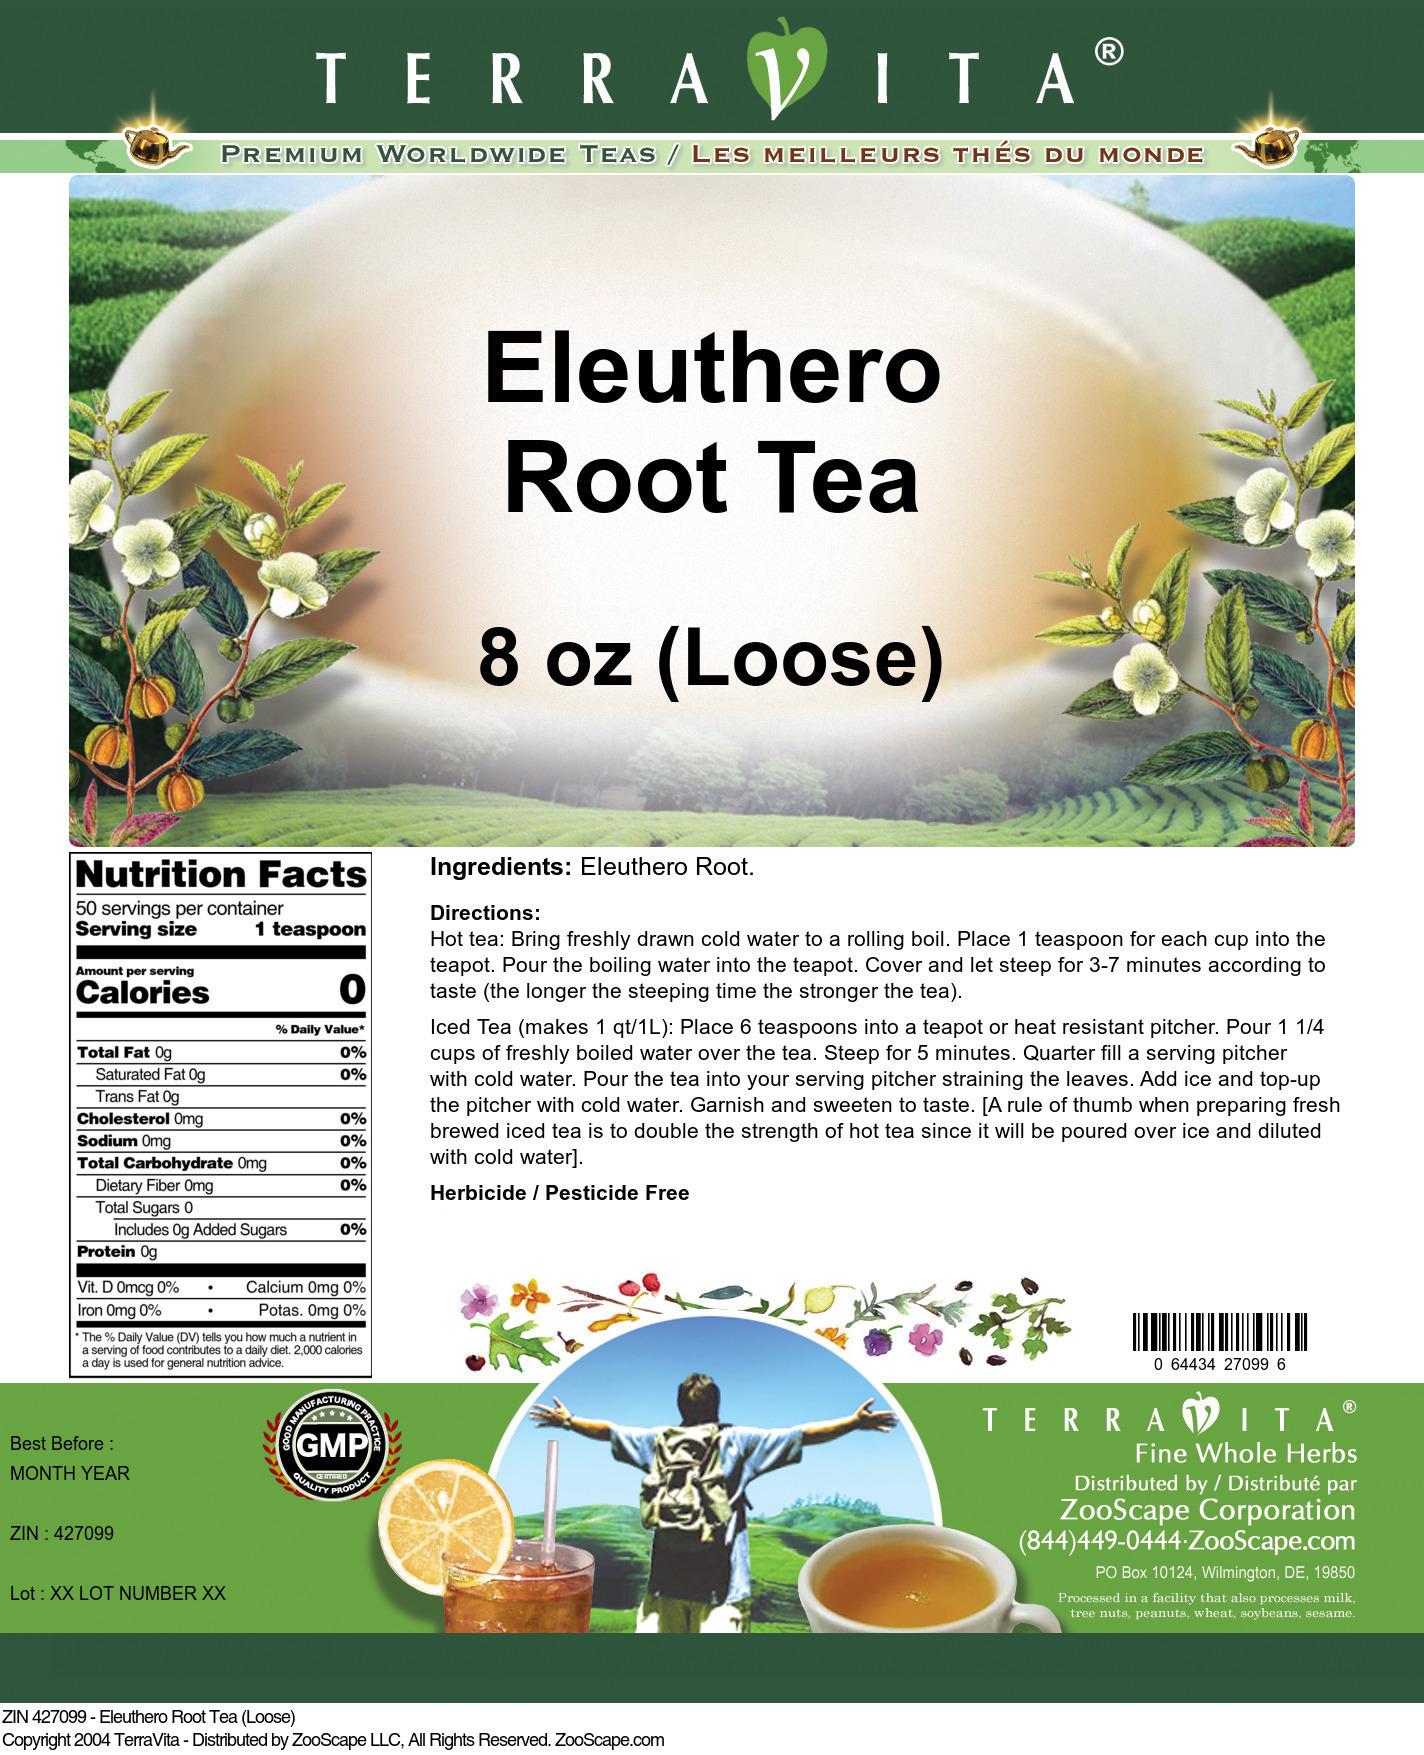 Eleuthero Root Tea (Loose)